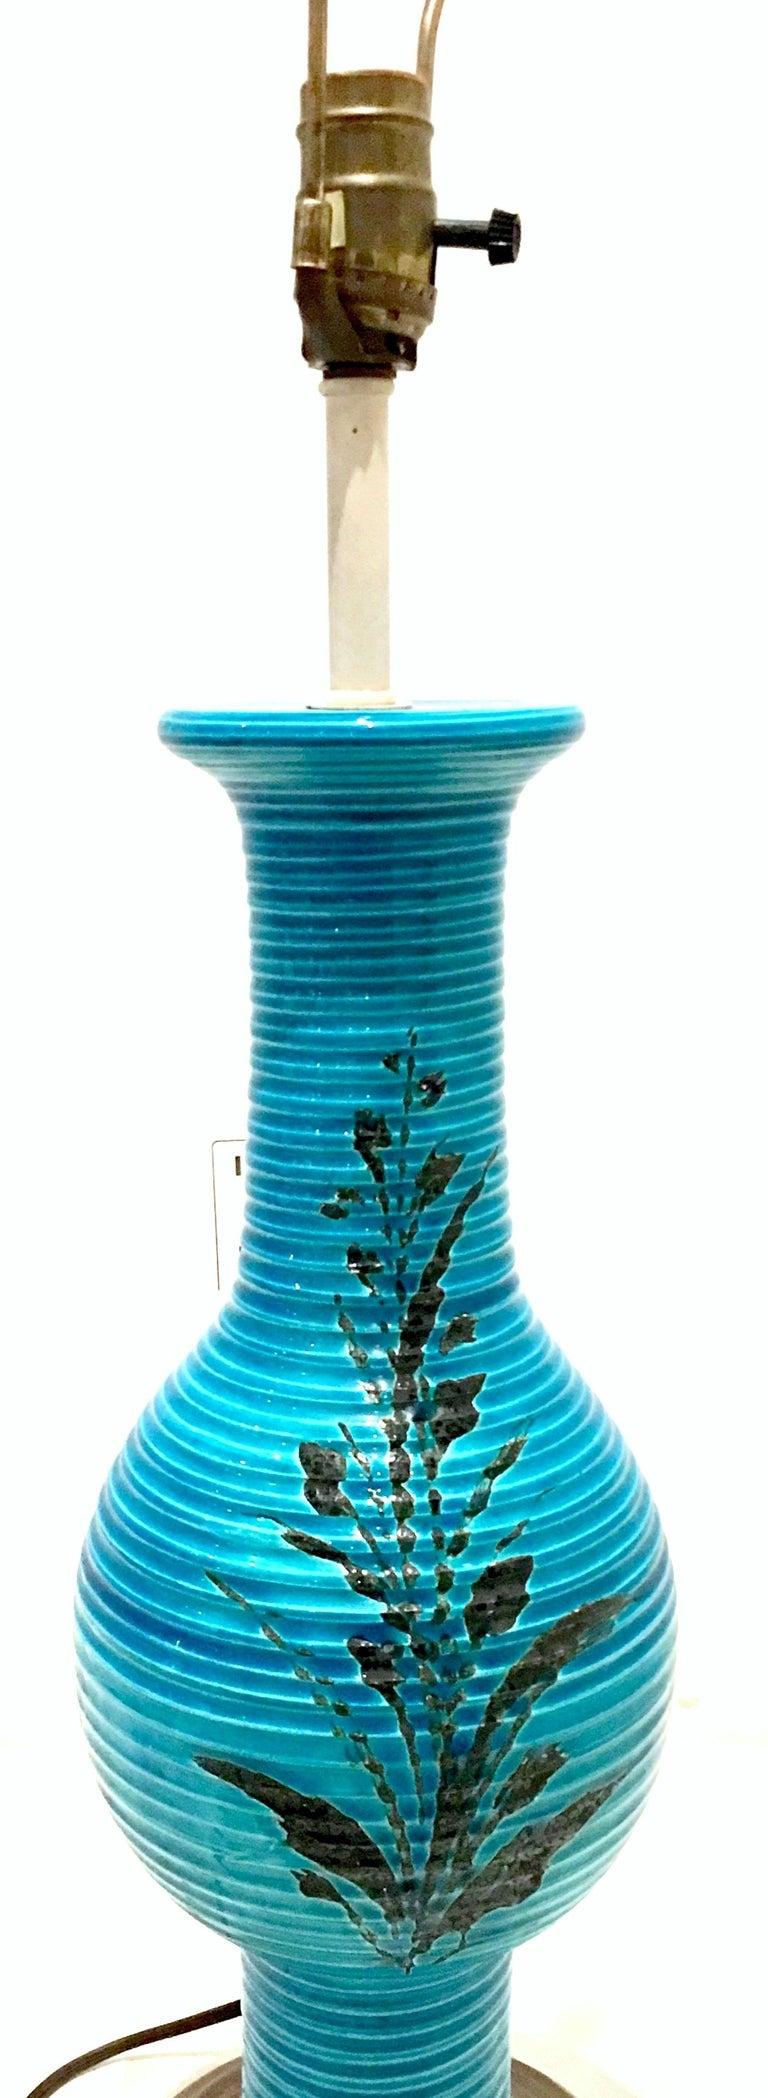 1960s Italian Cerulean Blue & Black Ceramic Glaze Pottery Lamp by, Bitossi For Sale 1